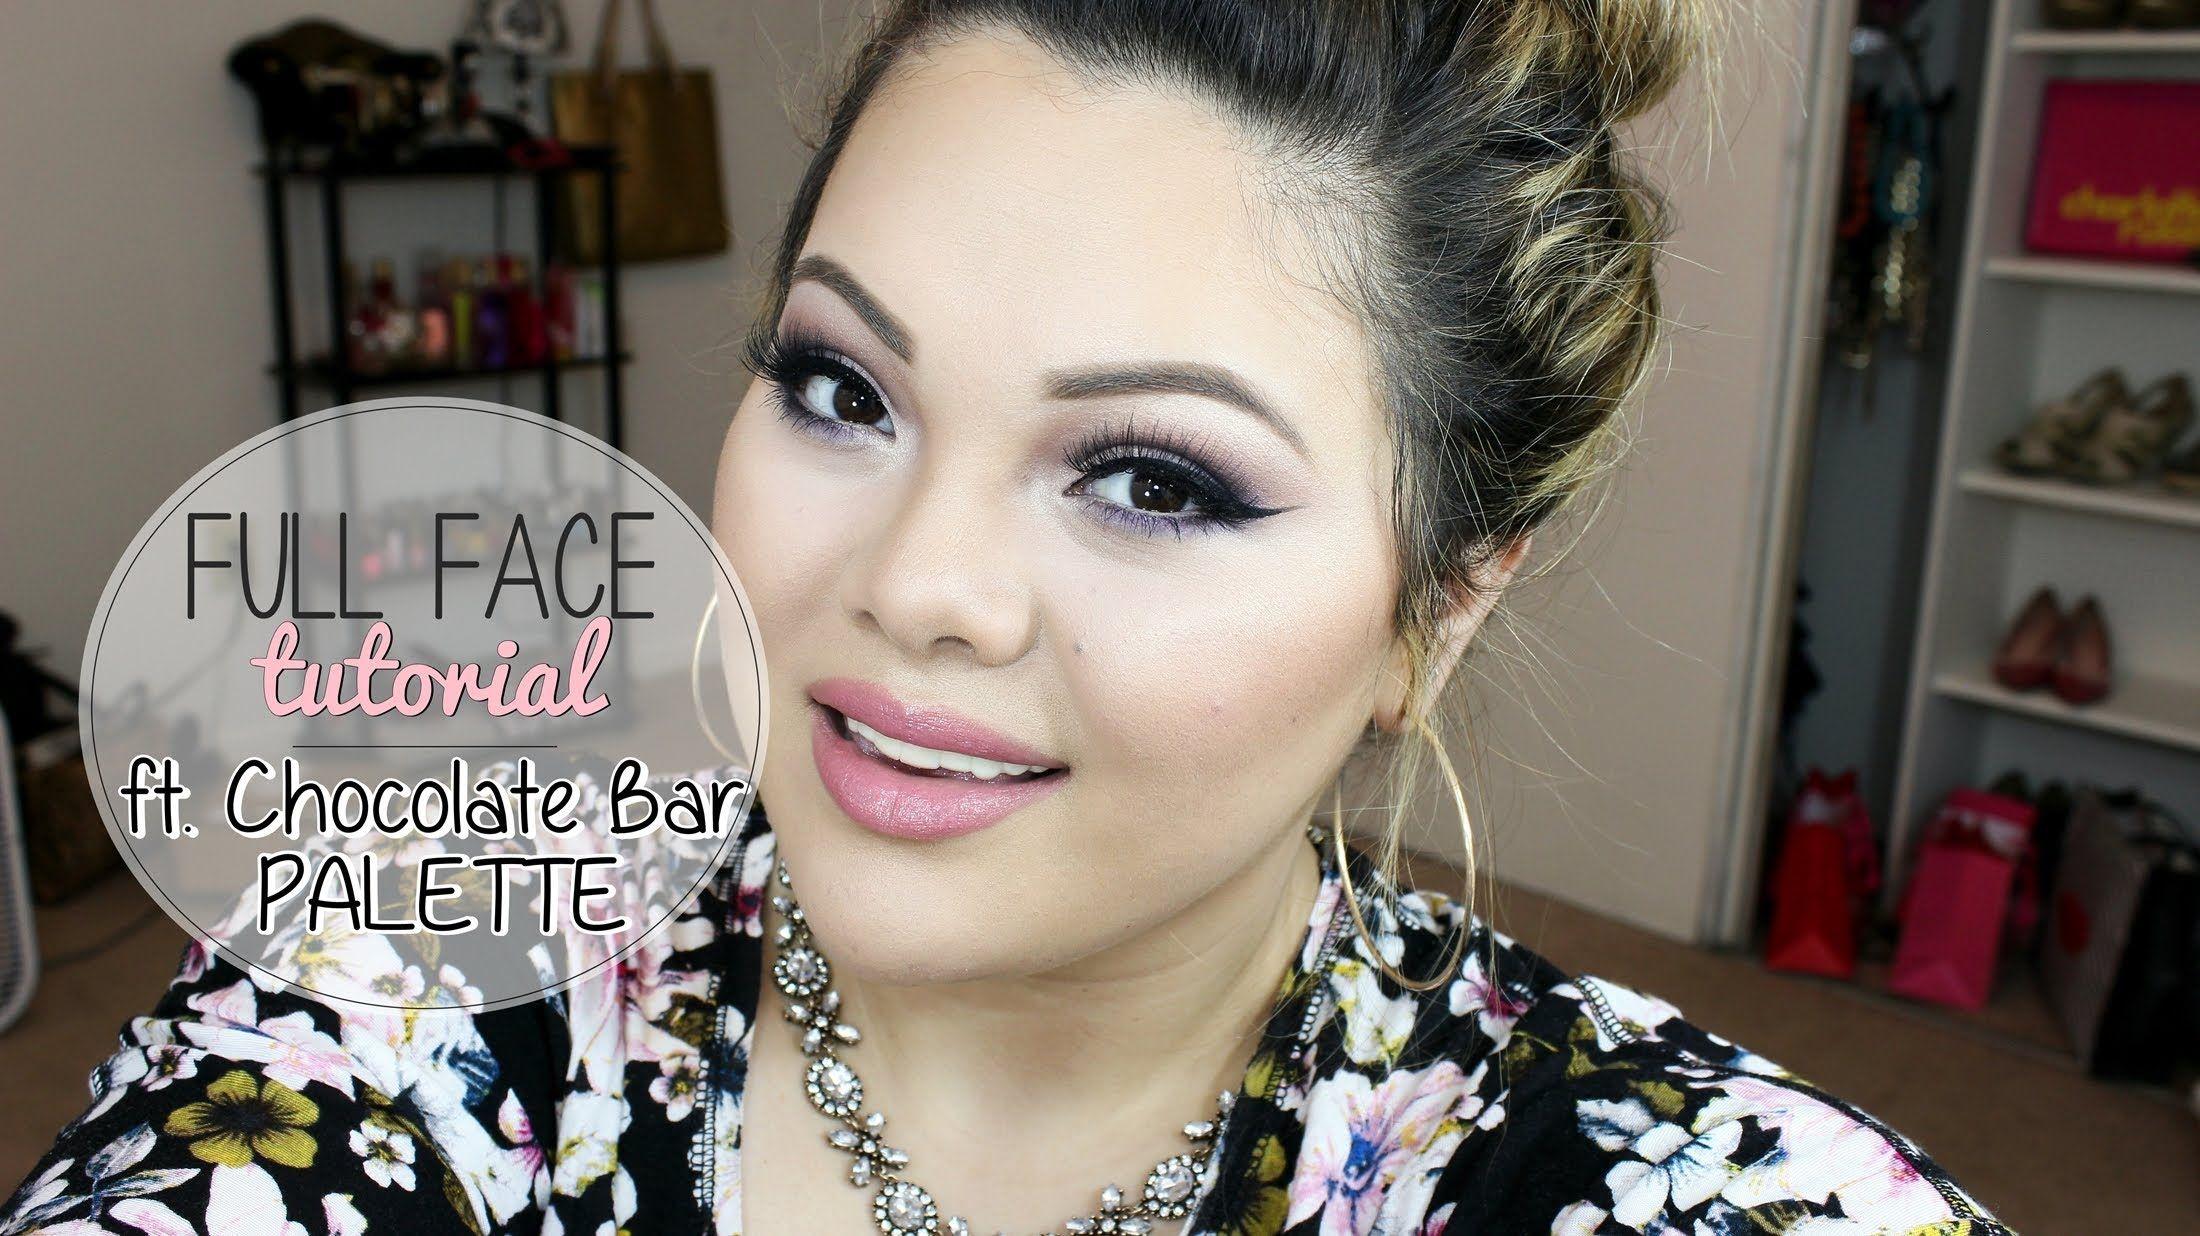 Full Face Makeup Tutorial ft Chocolate Bar Palette